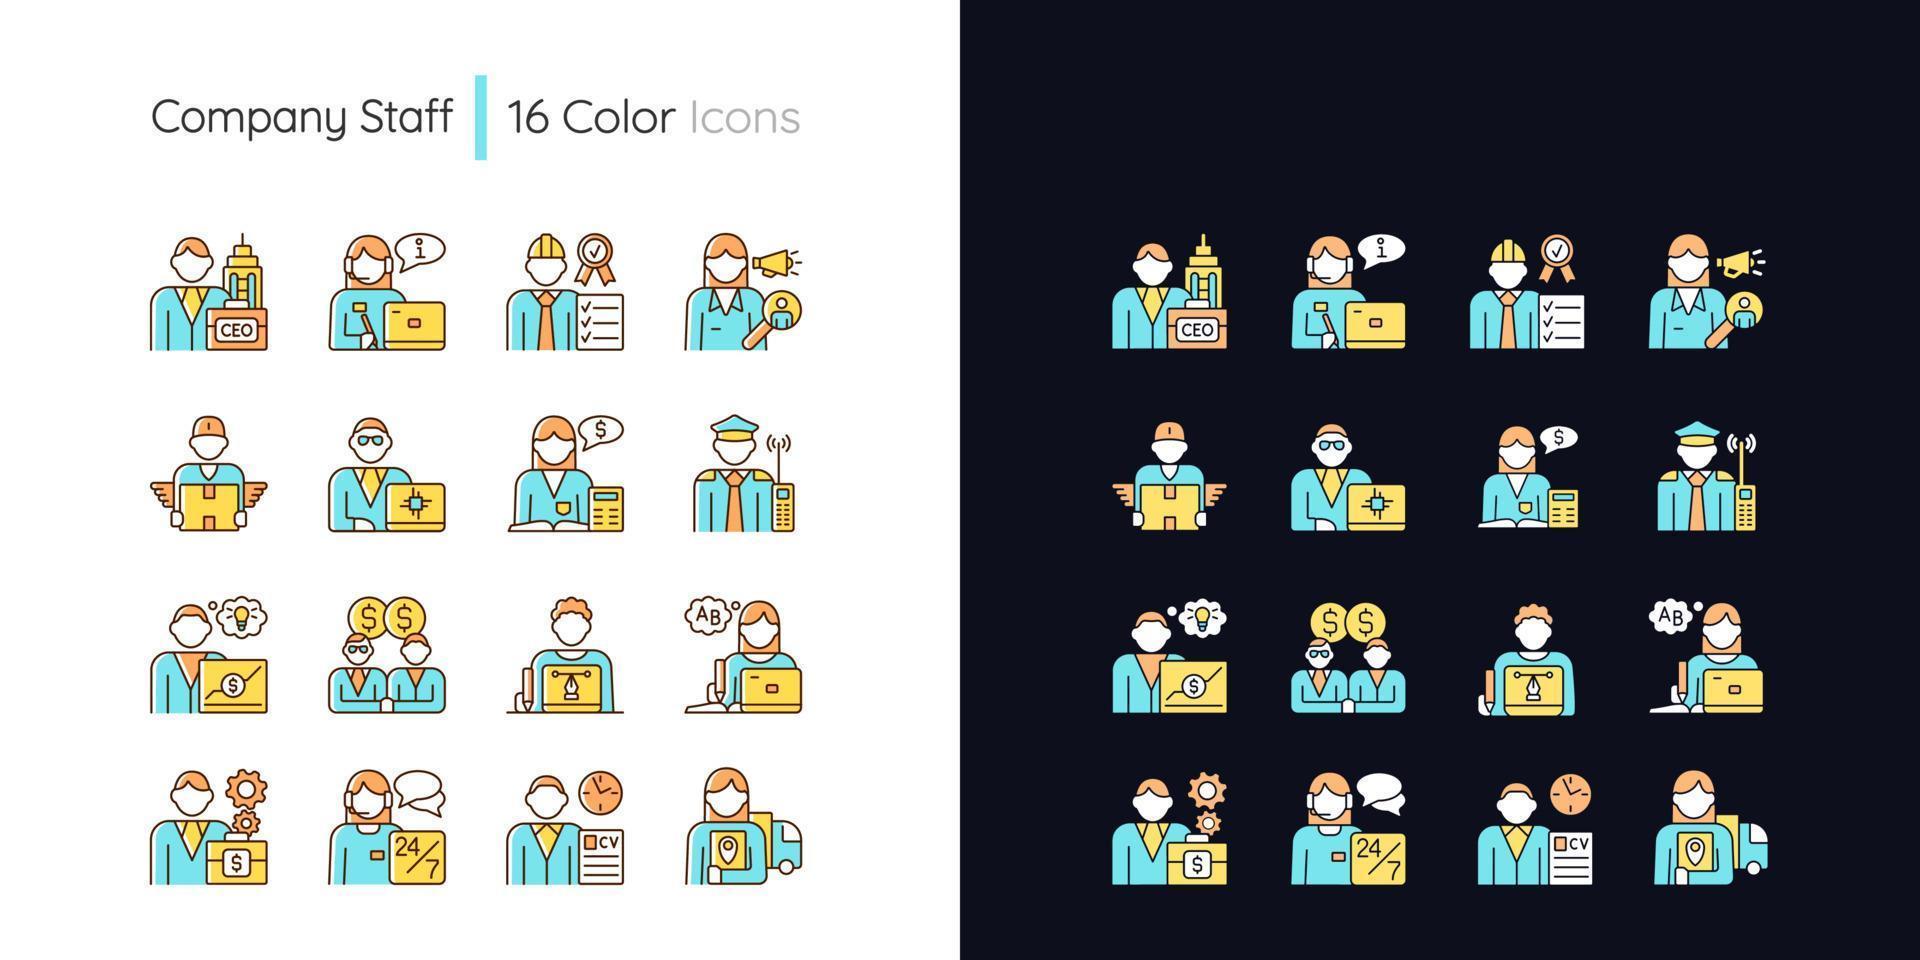 Firmenpersonal bezogenes helles und dunkles Thema RGB-Farbsymbole eingestellt vektor